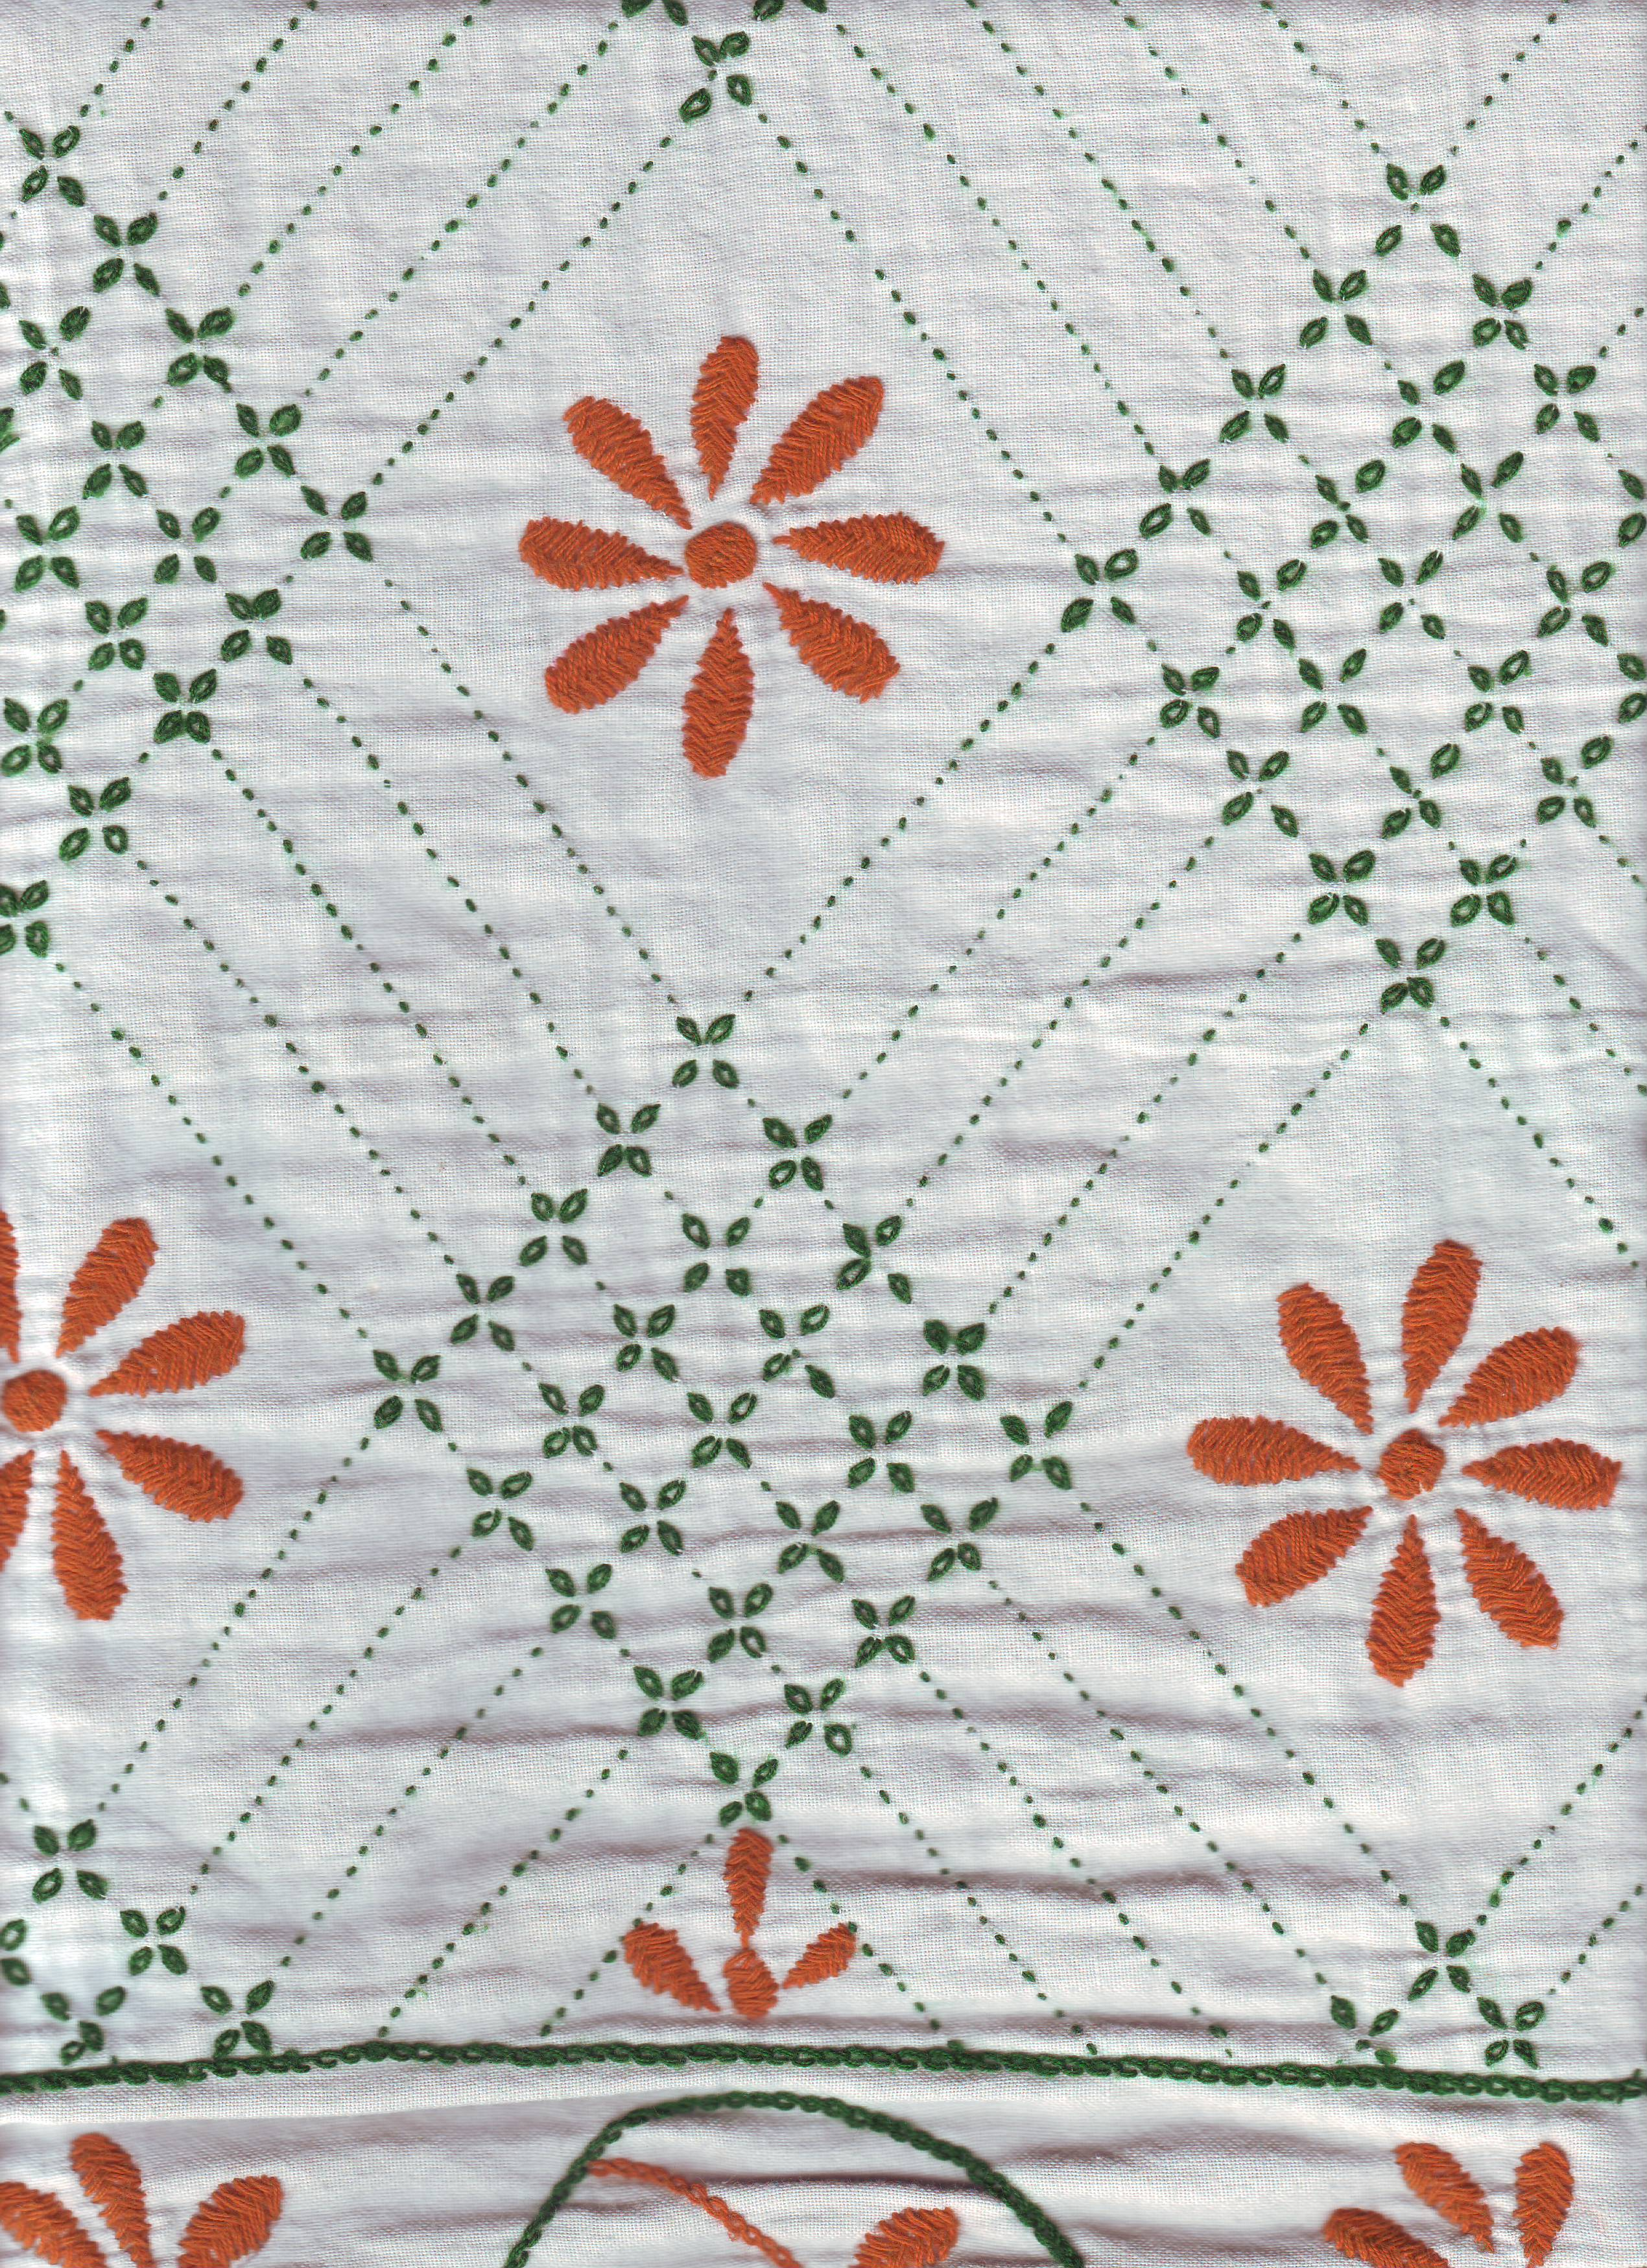 Hand embroidery patterns free joy studio design gallery